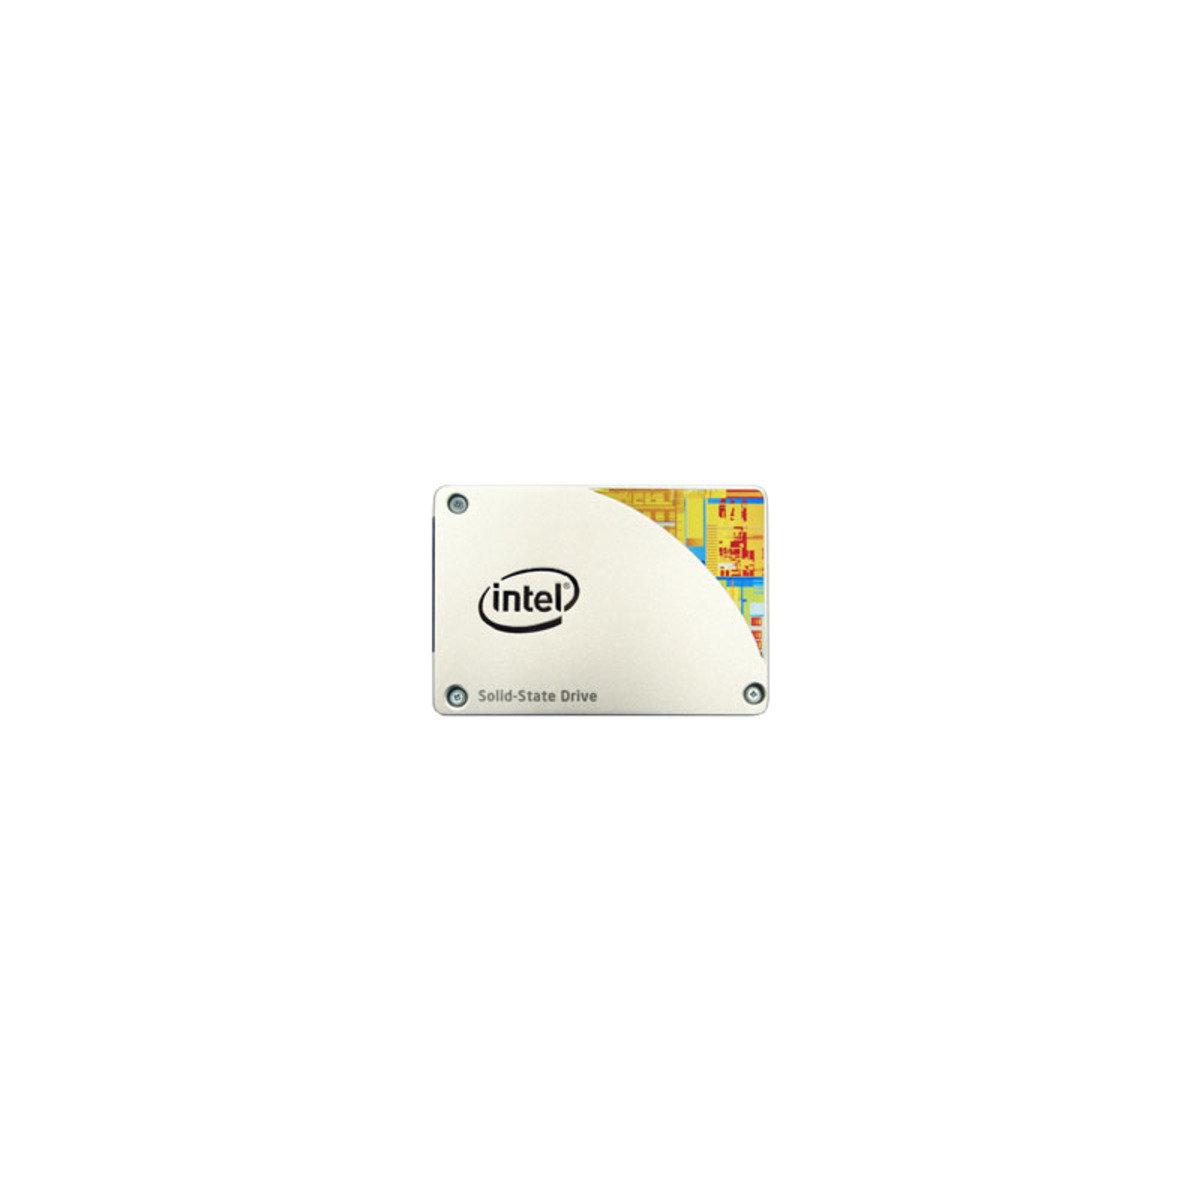 SSD 高速內置固態硬碟 535系列 240GB [OEM包裝]